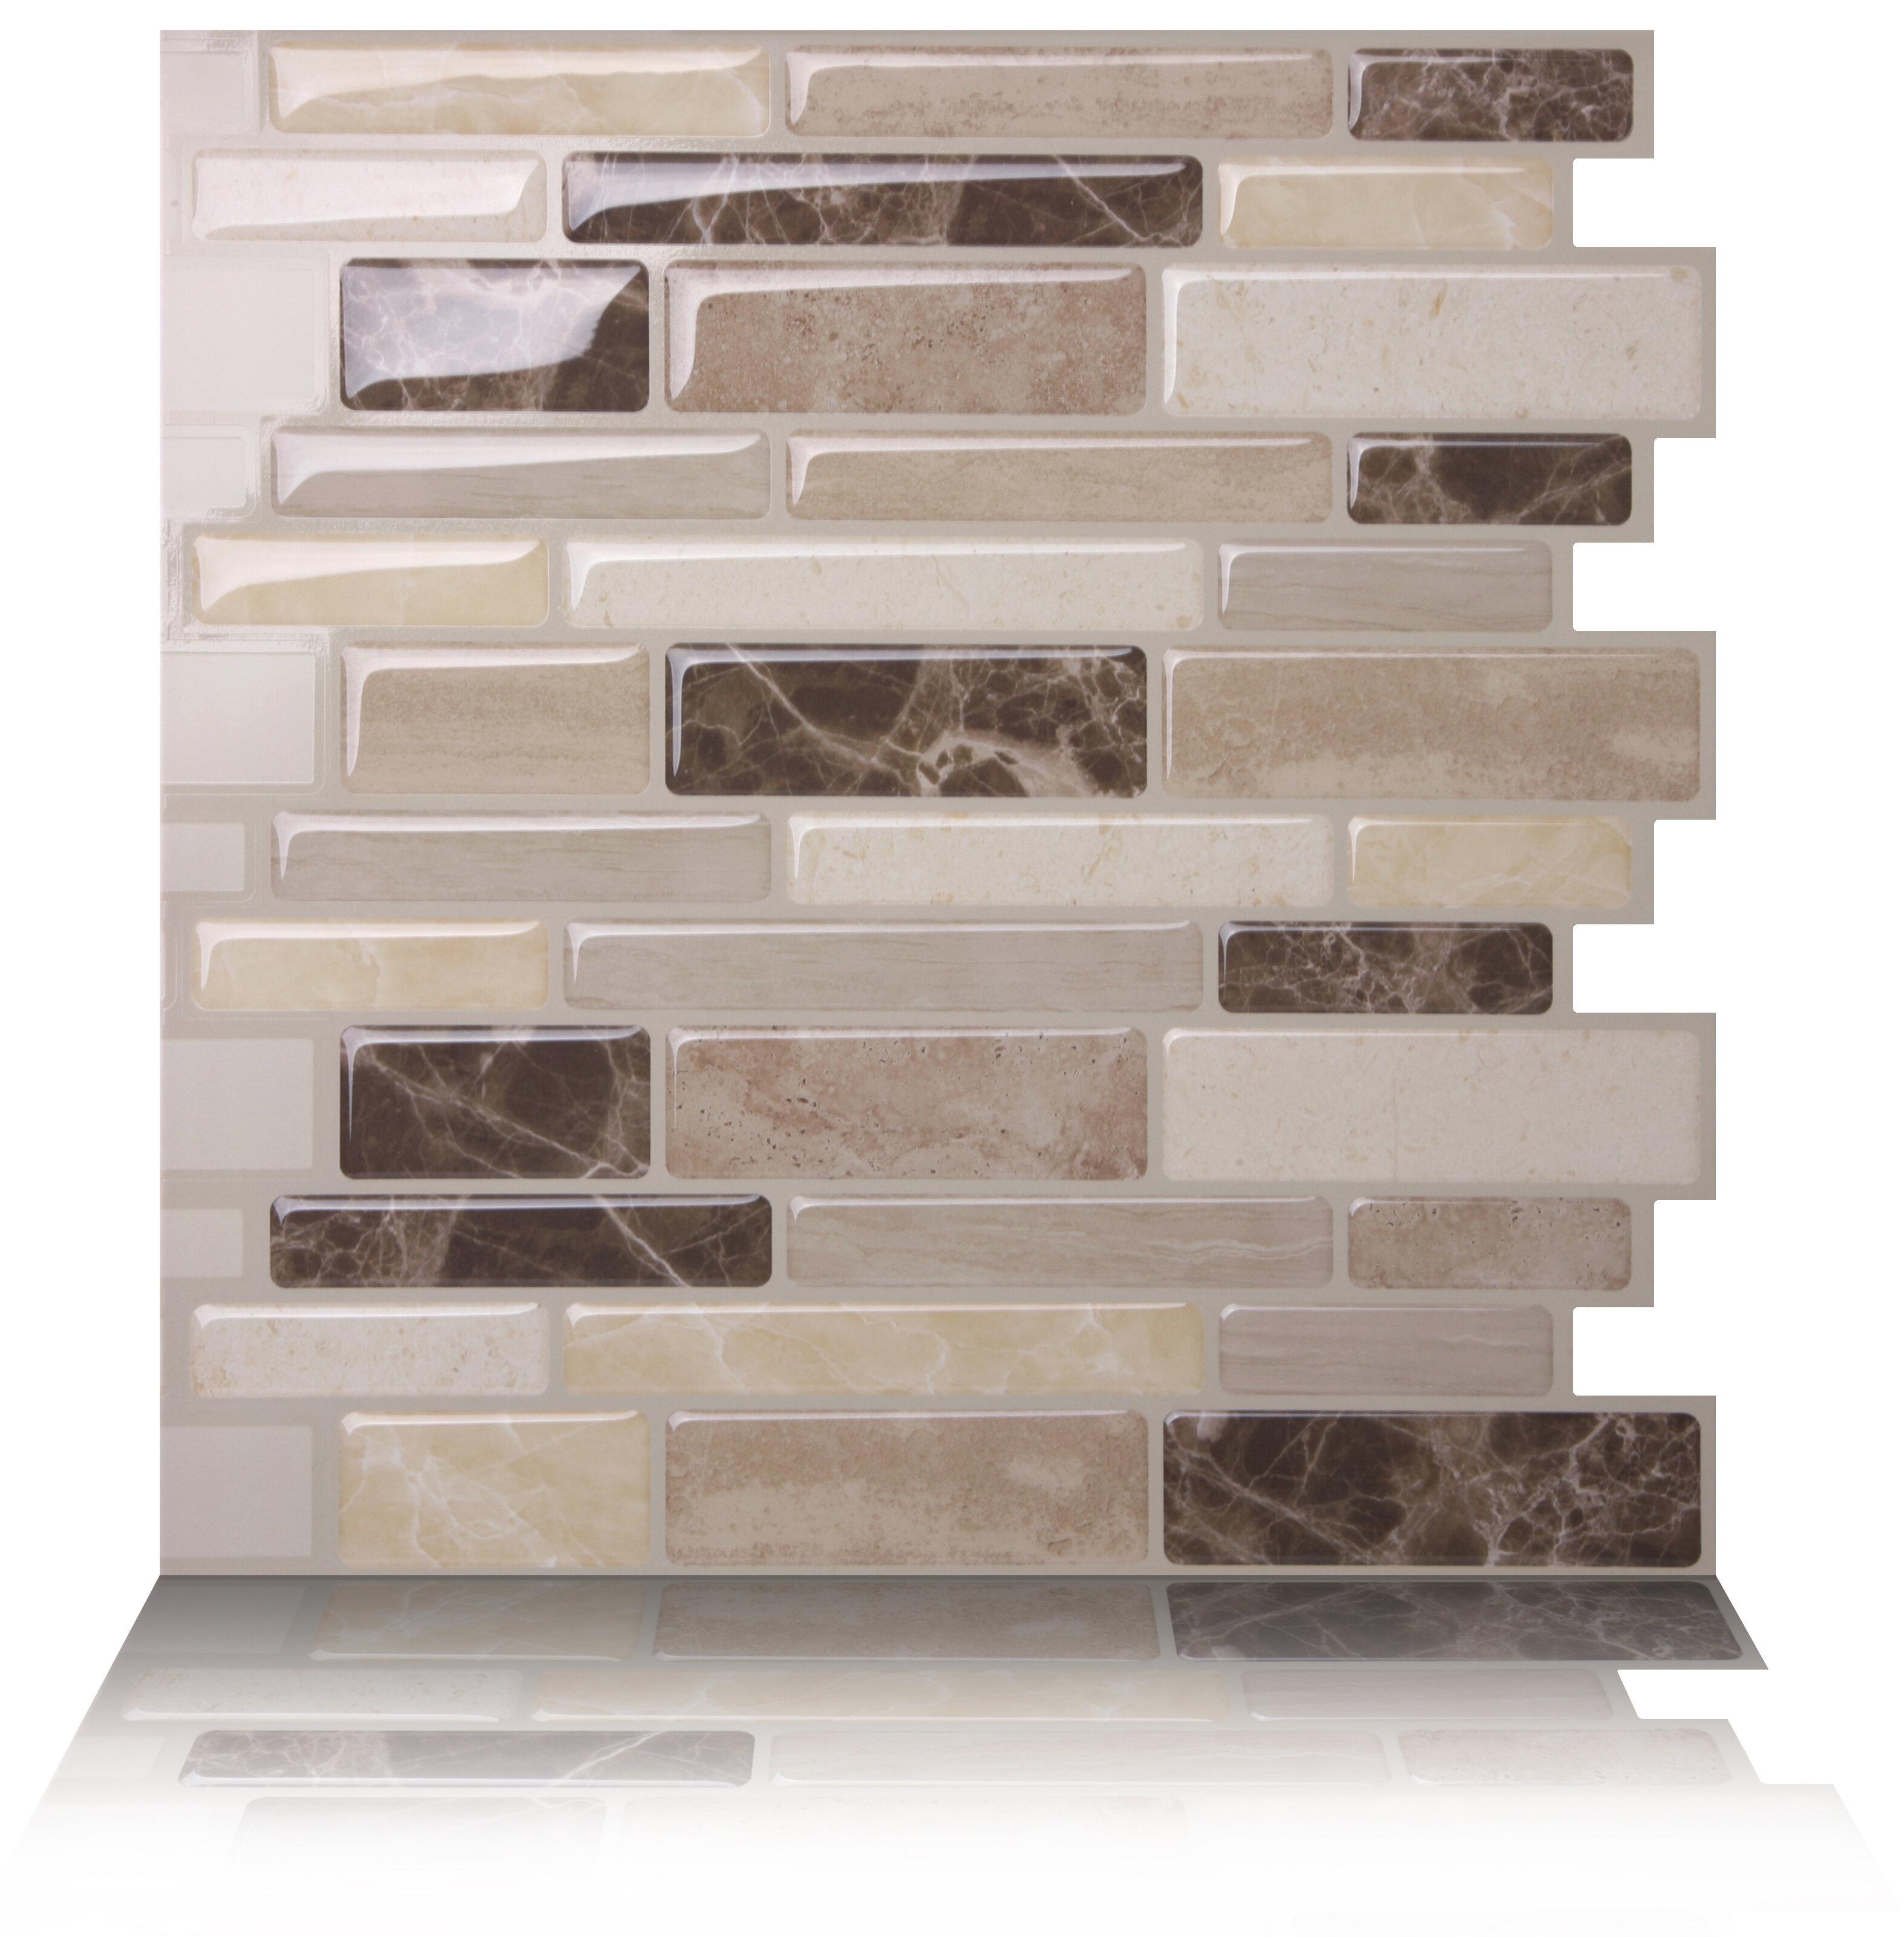 "Carrelage Metro Blanc Joint Gris tictactiles 10"" x 10"" pvc peel & stick mosaic tile in brown"